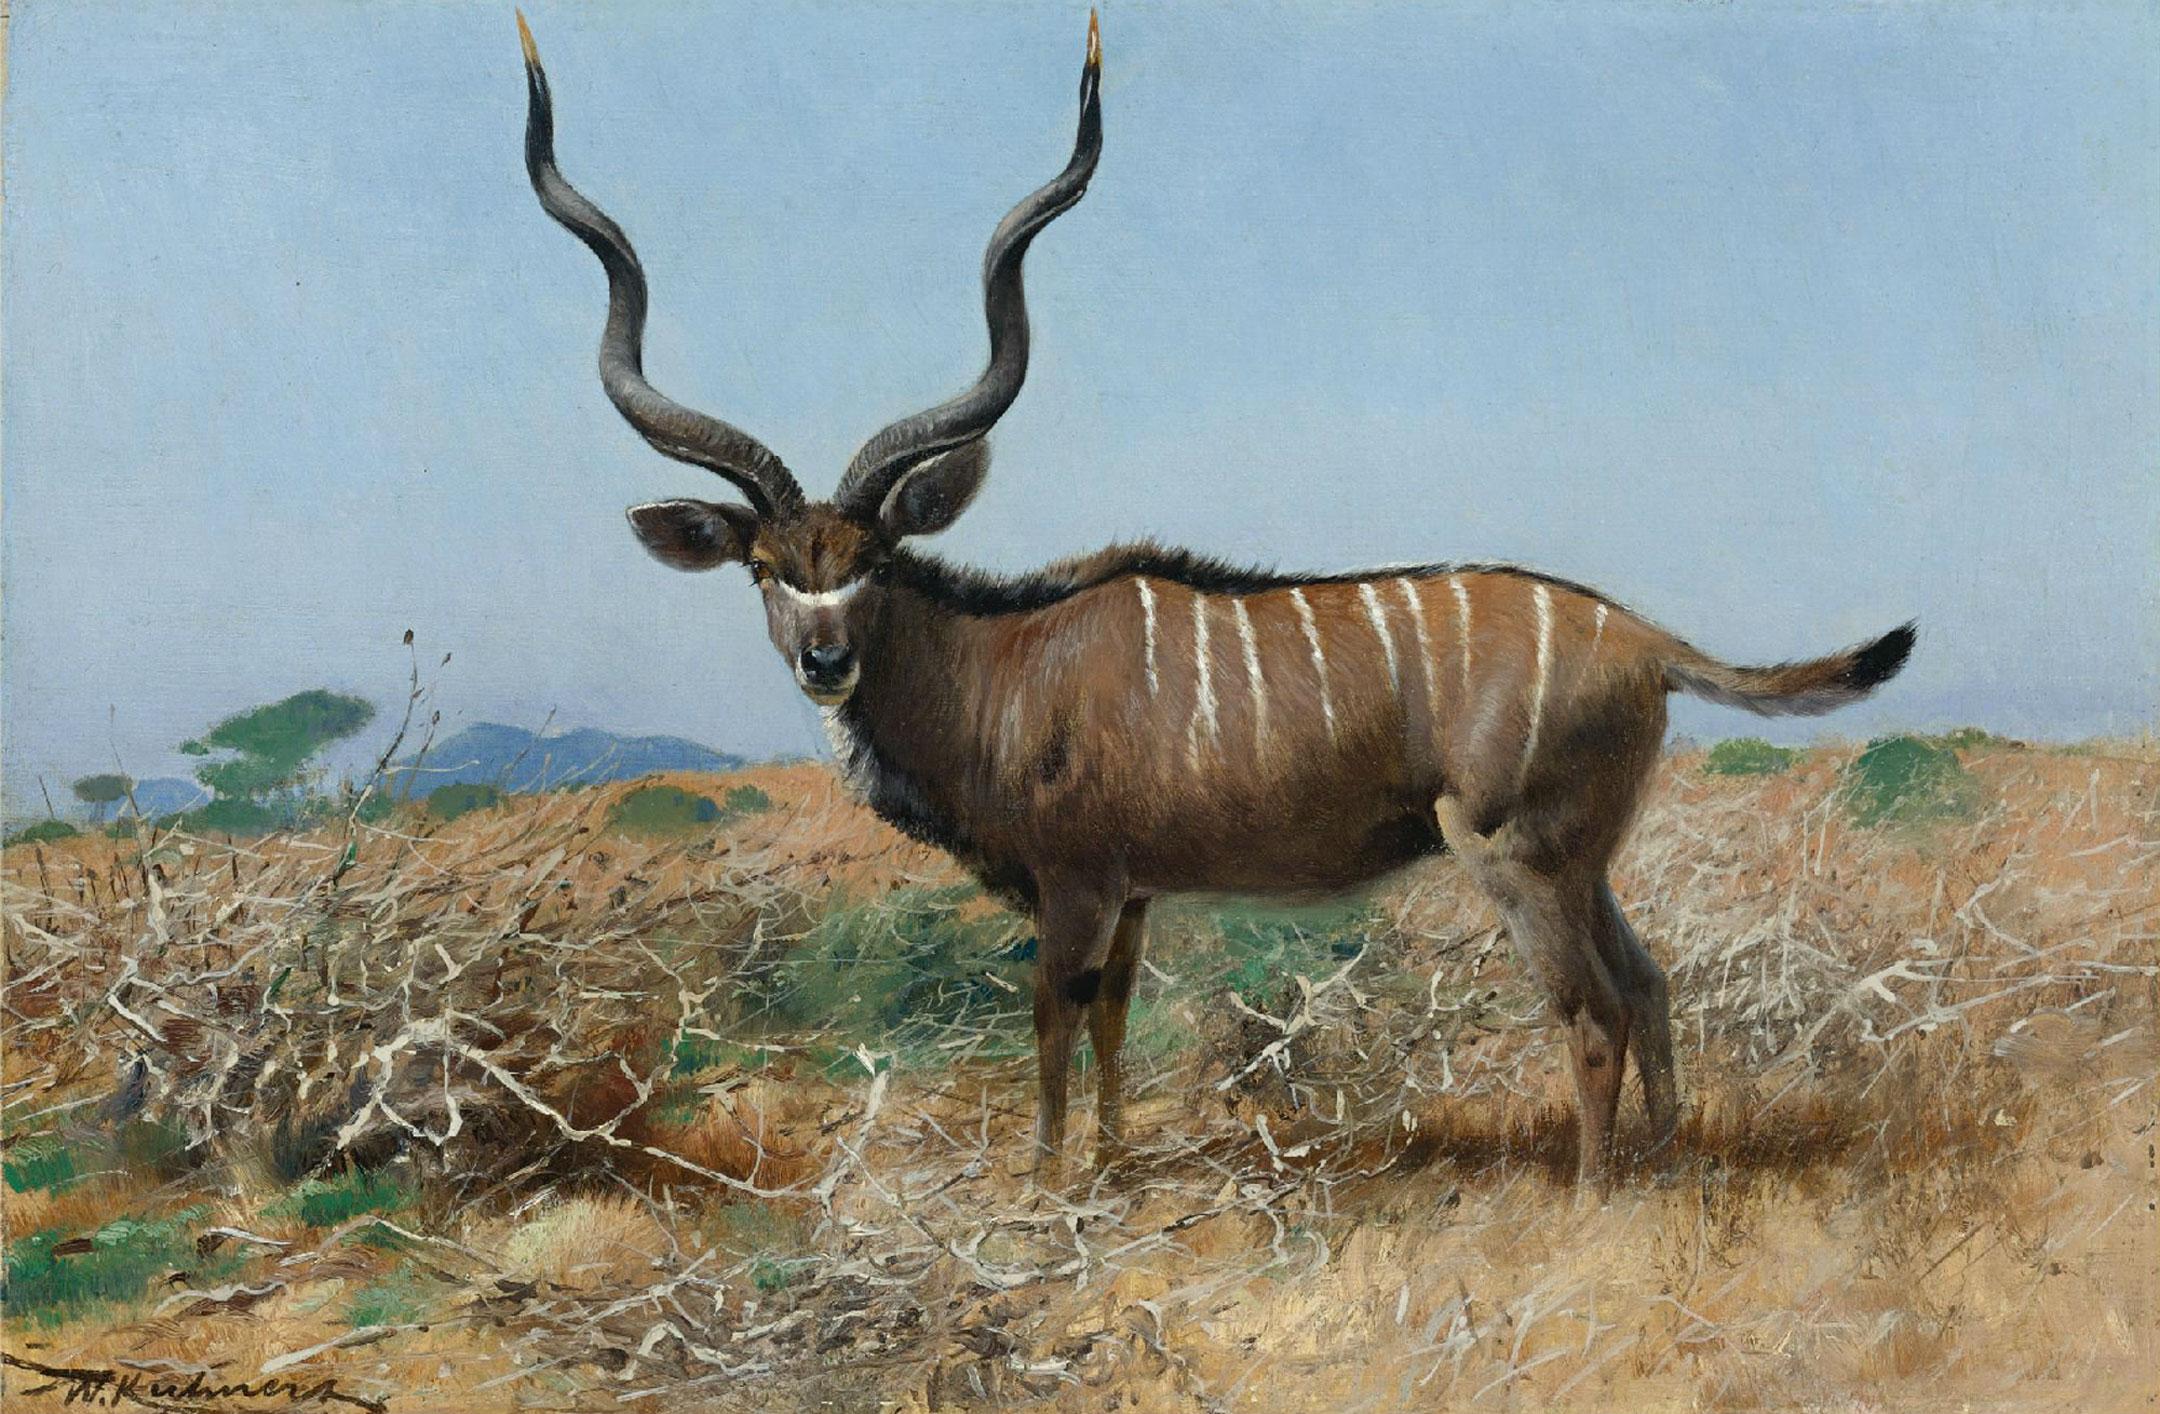 Antelope_kuhnert